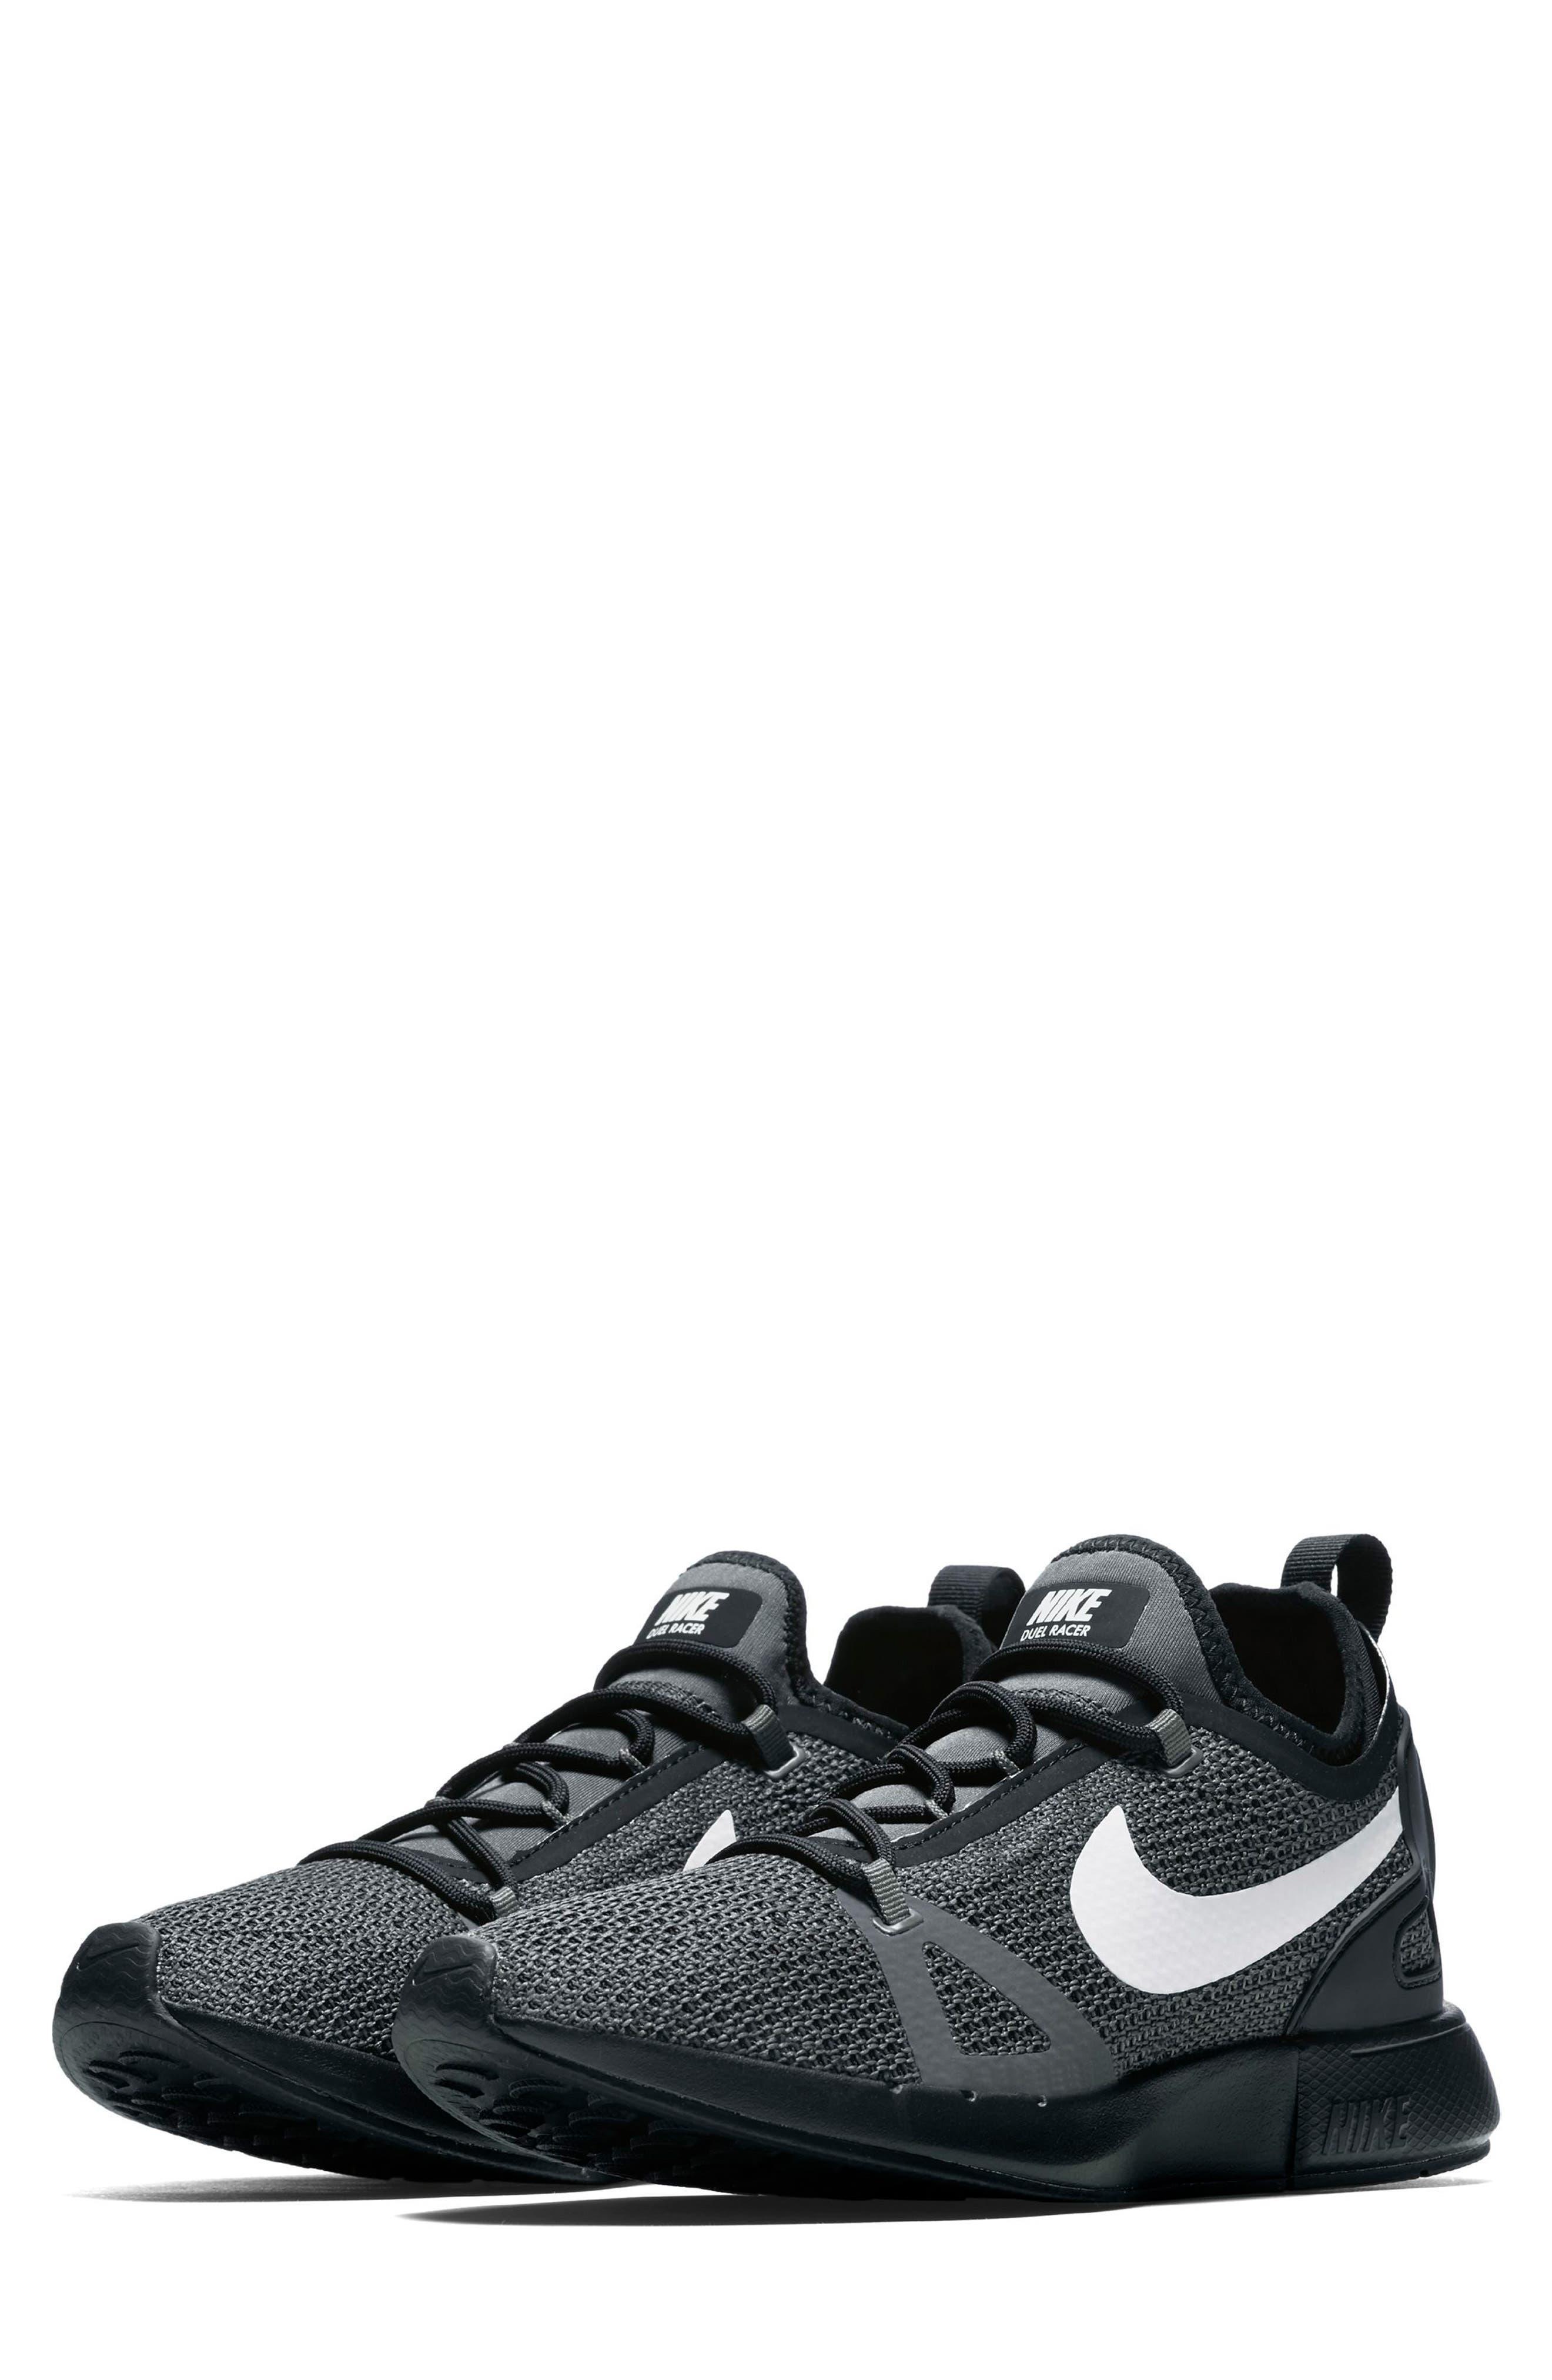 Alternate Image 1 Selected - Nike Duel Racer PRM Running Shoe (Women)